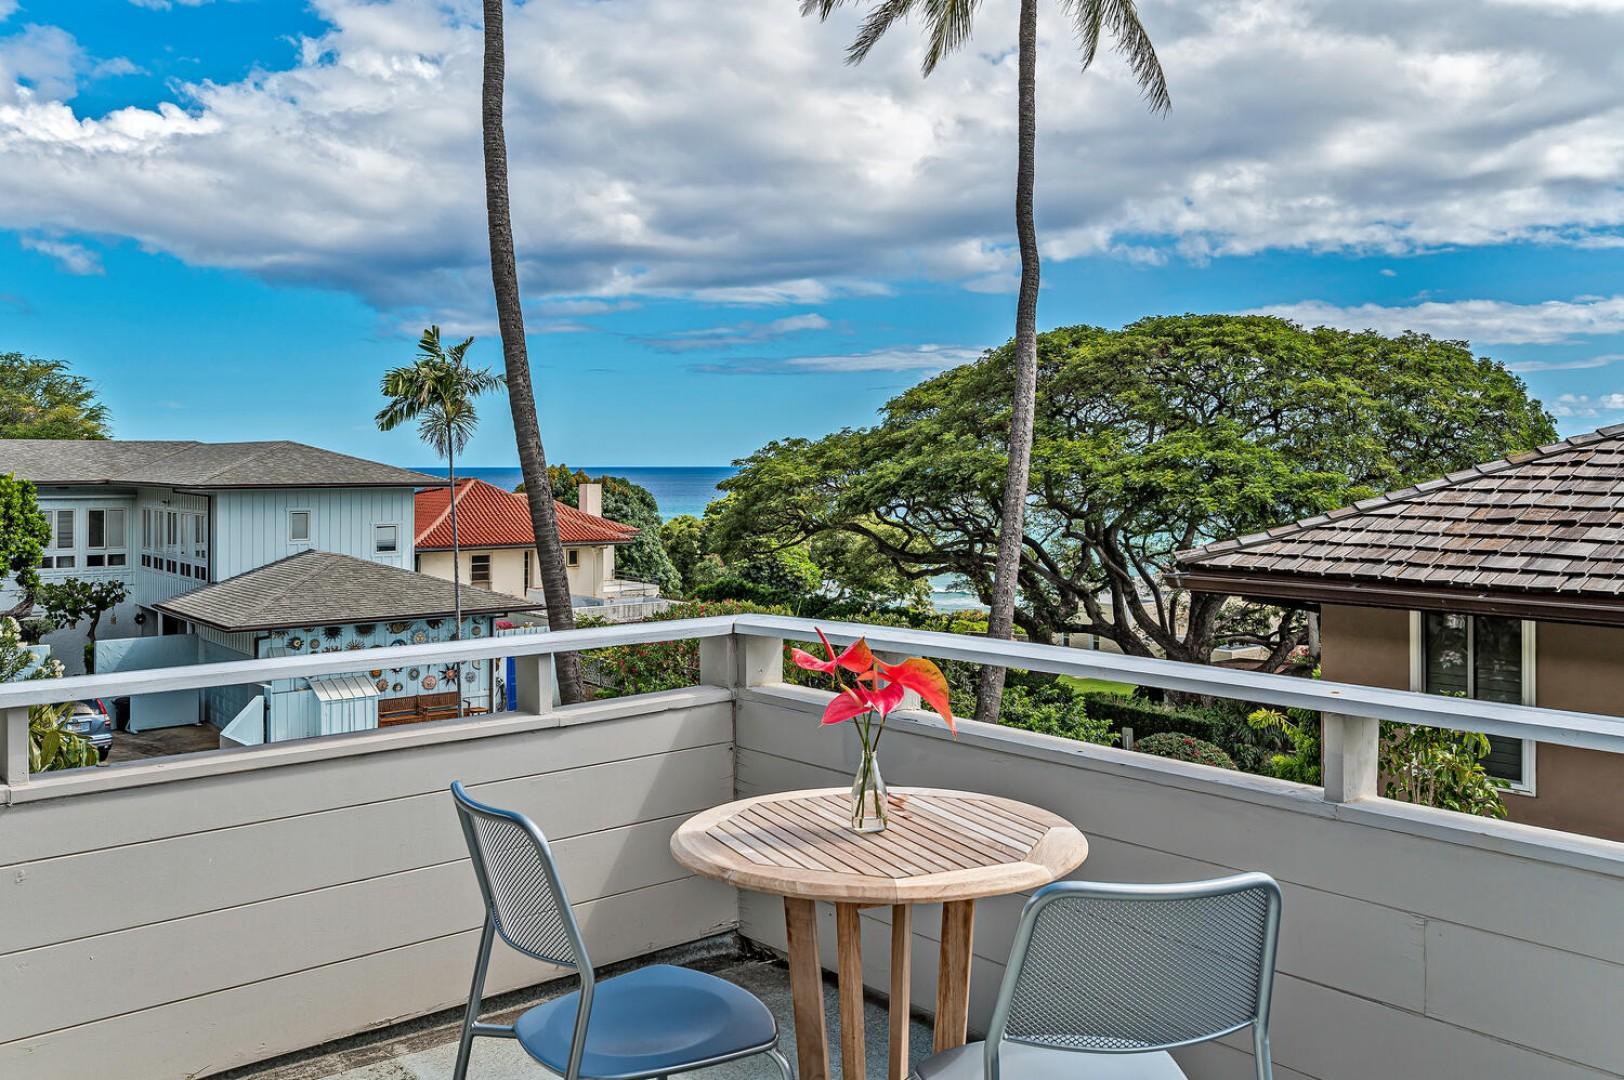 Balcony seating off master bedroom, ocean views